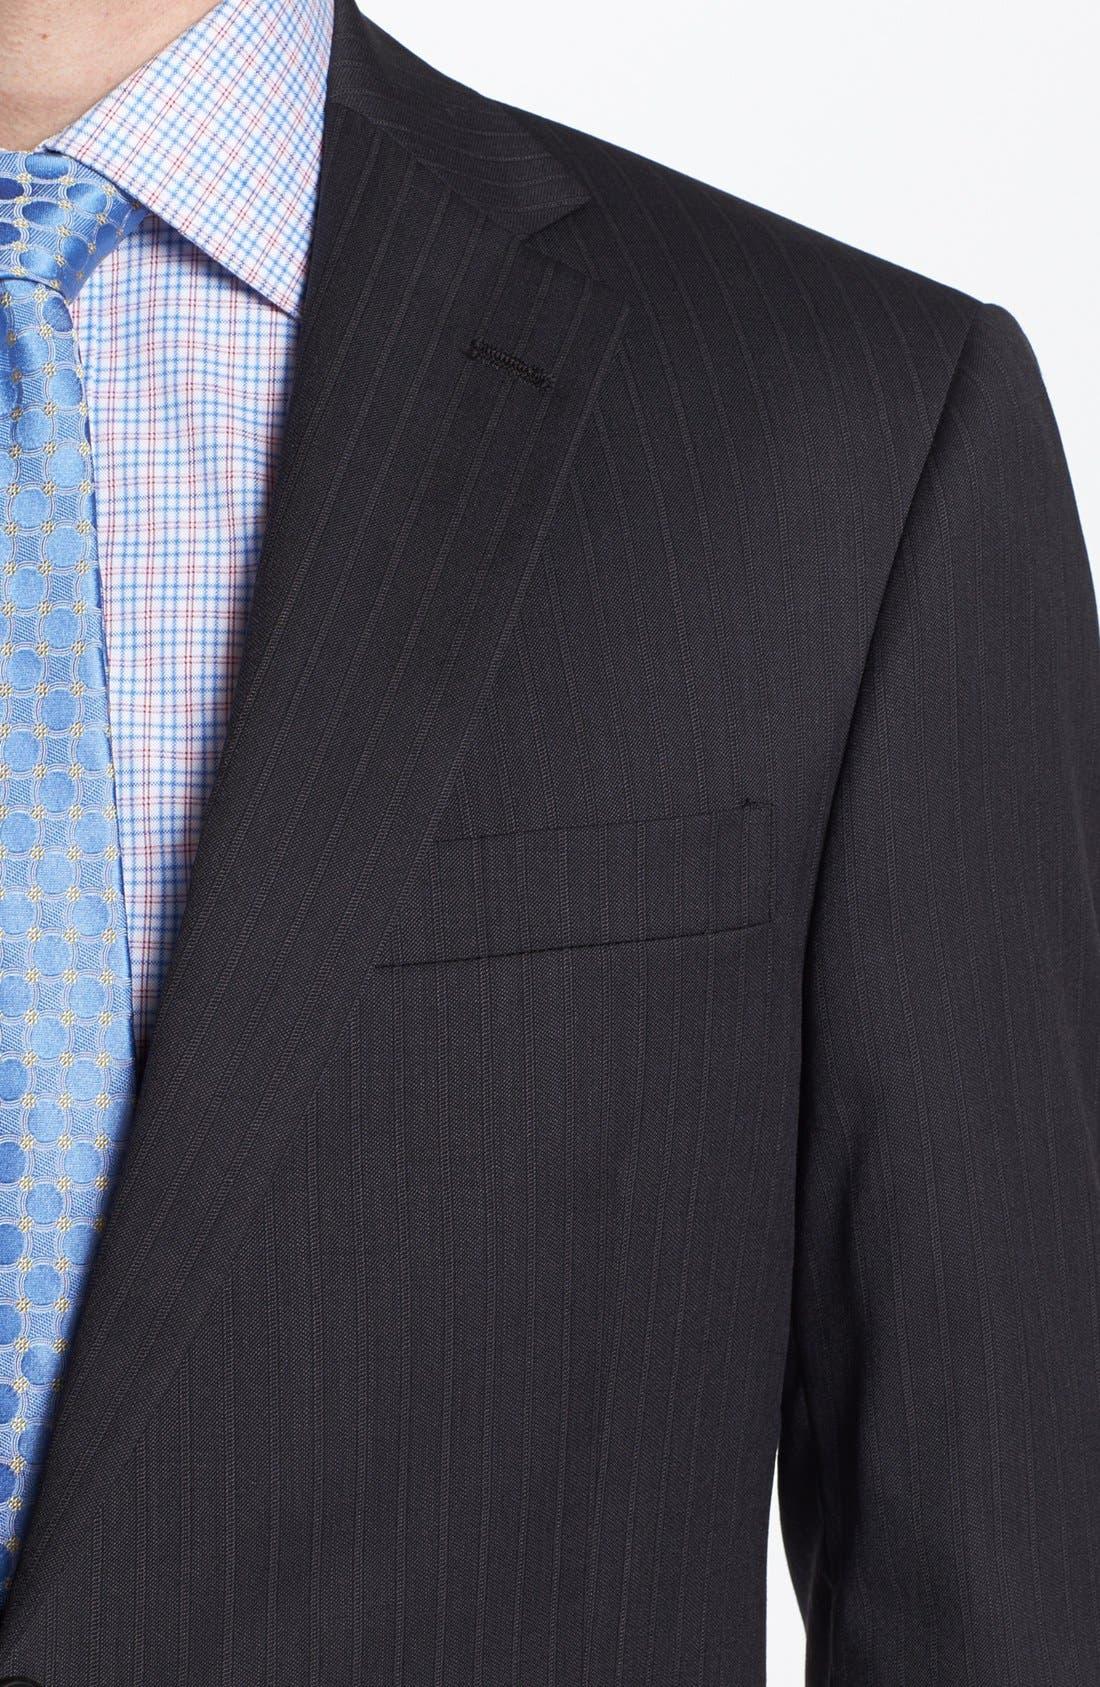 Alternate Image 2  - Hart Schaffner Marx Stripe Wool Suit